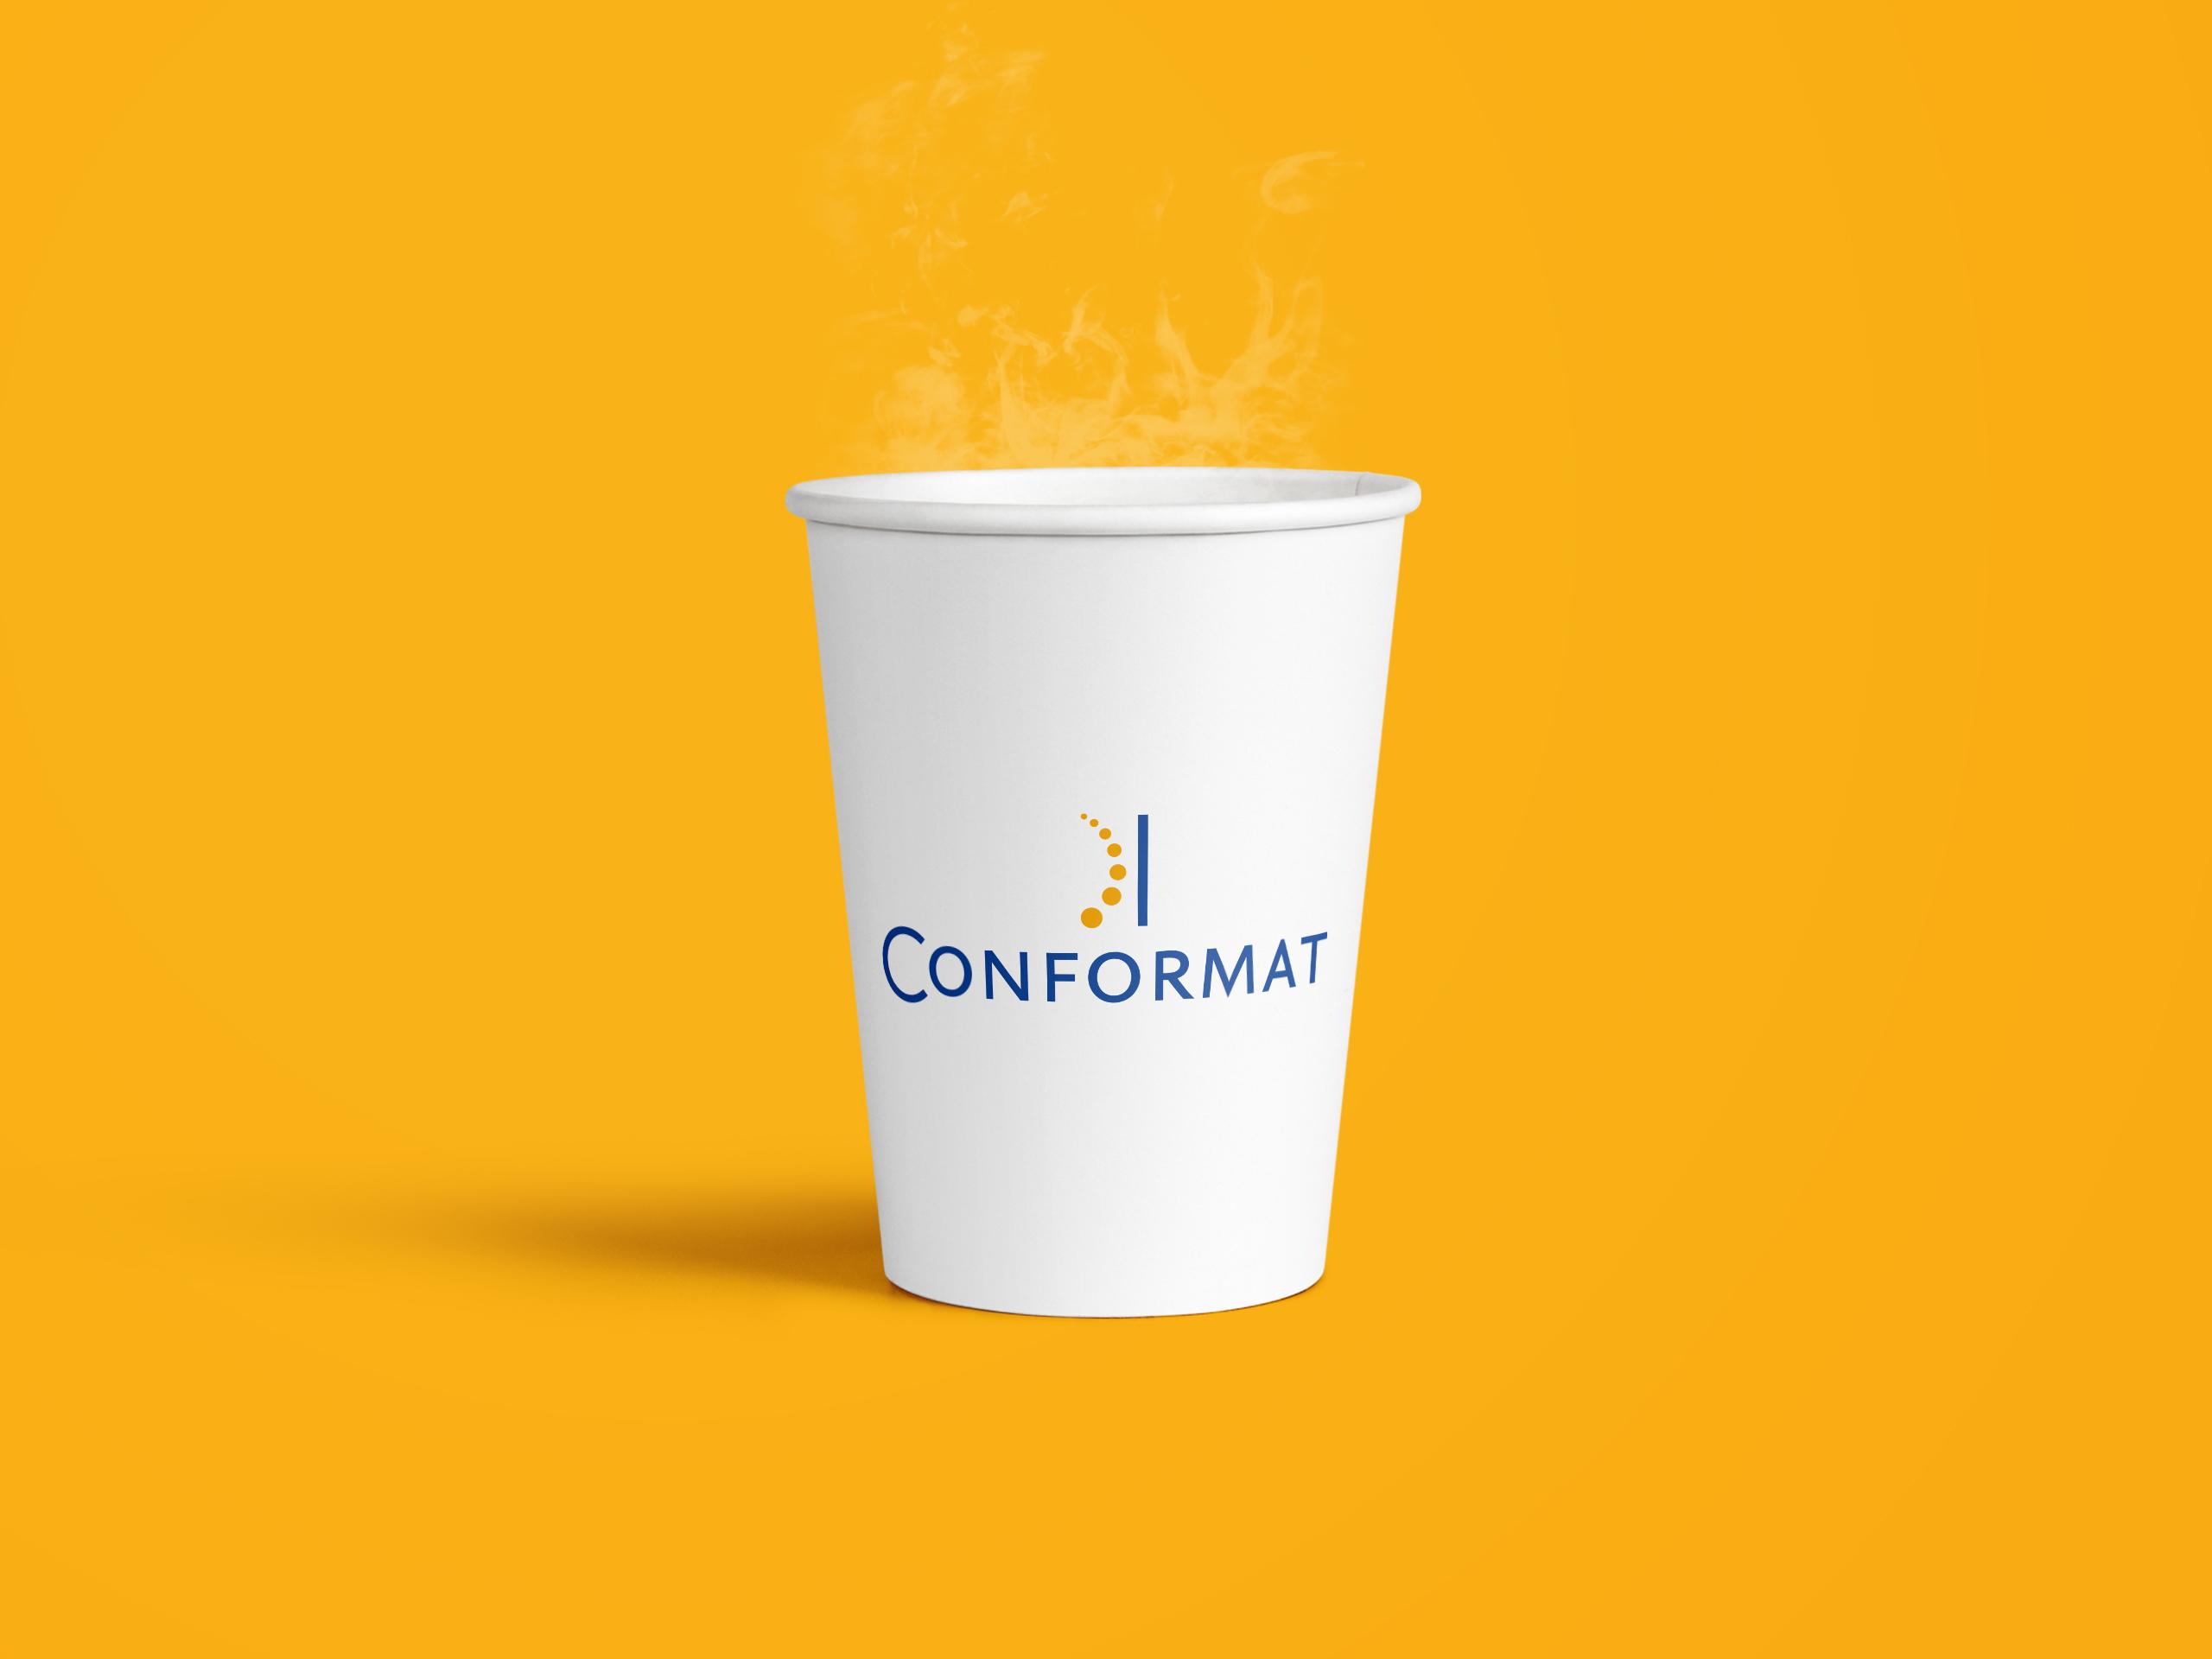 Conformat mug